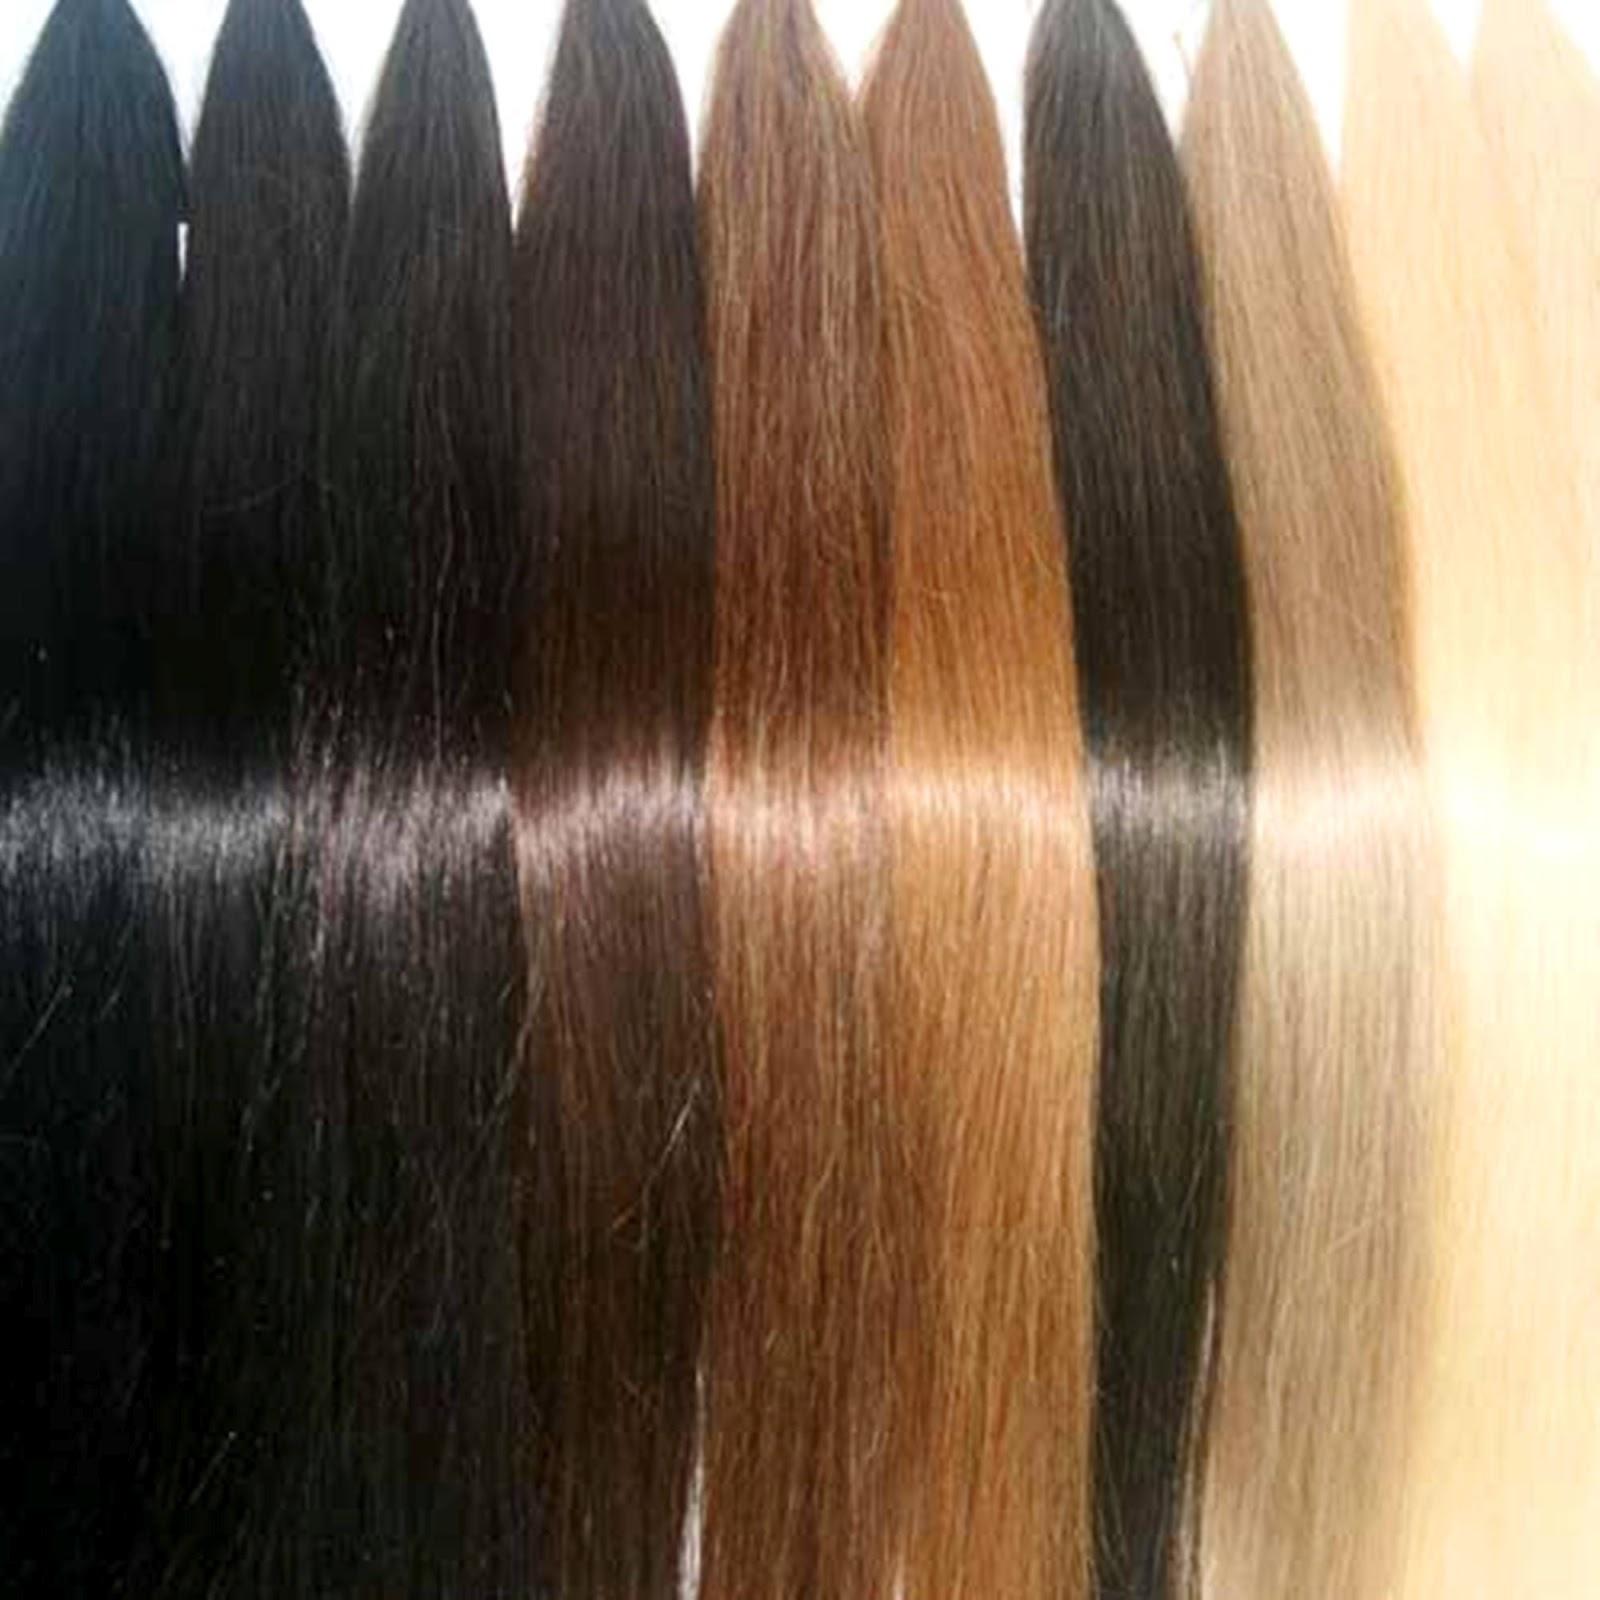 Deluxe Hair Styleartificial Hairsynthetic Hair Hair